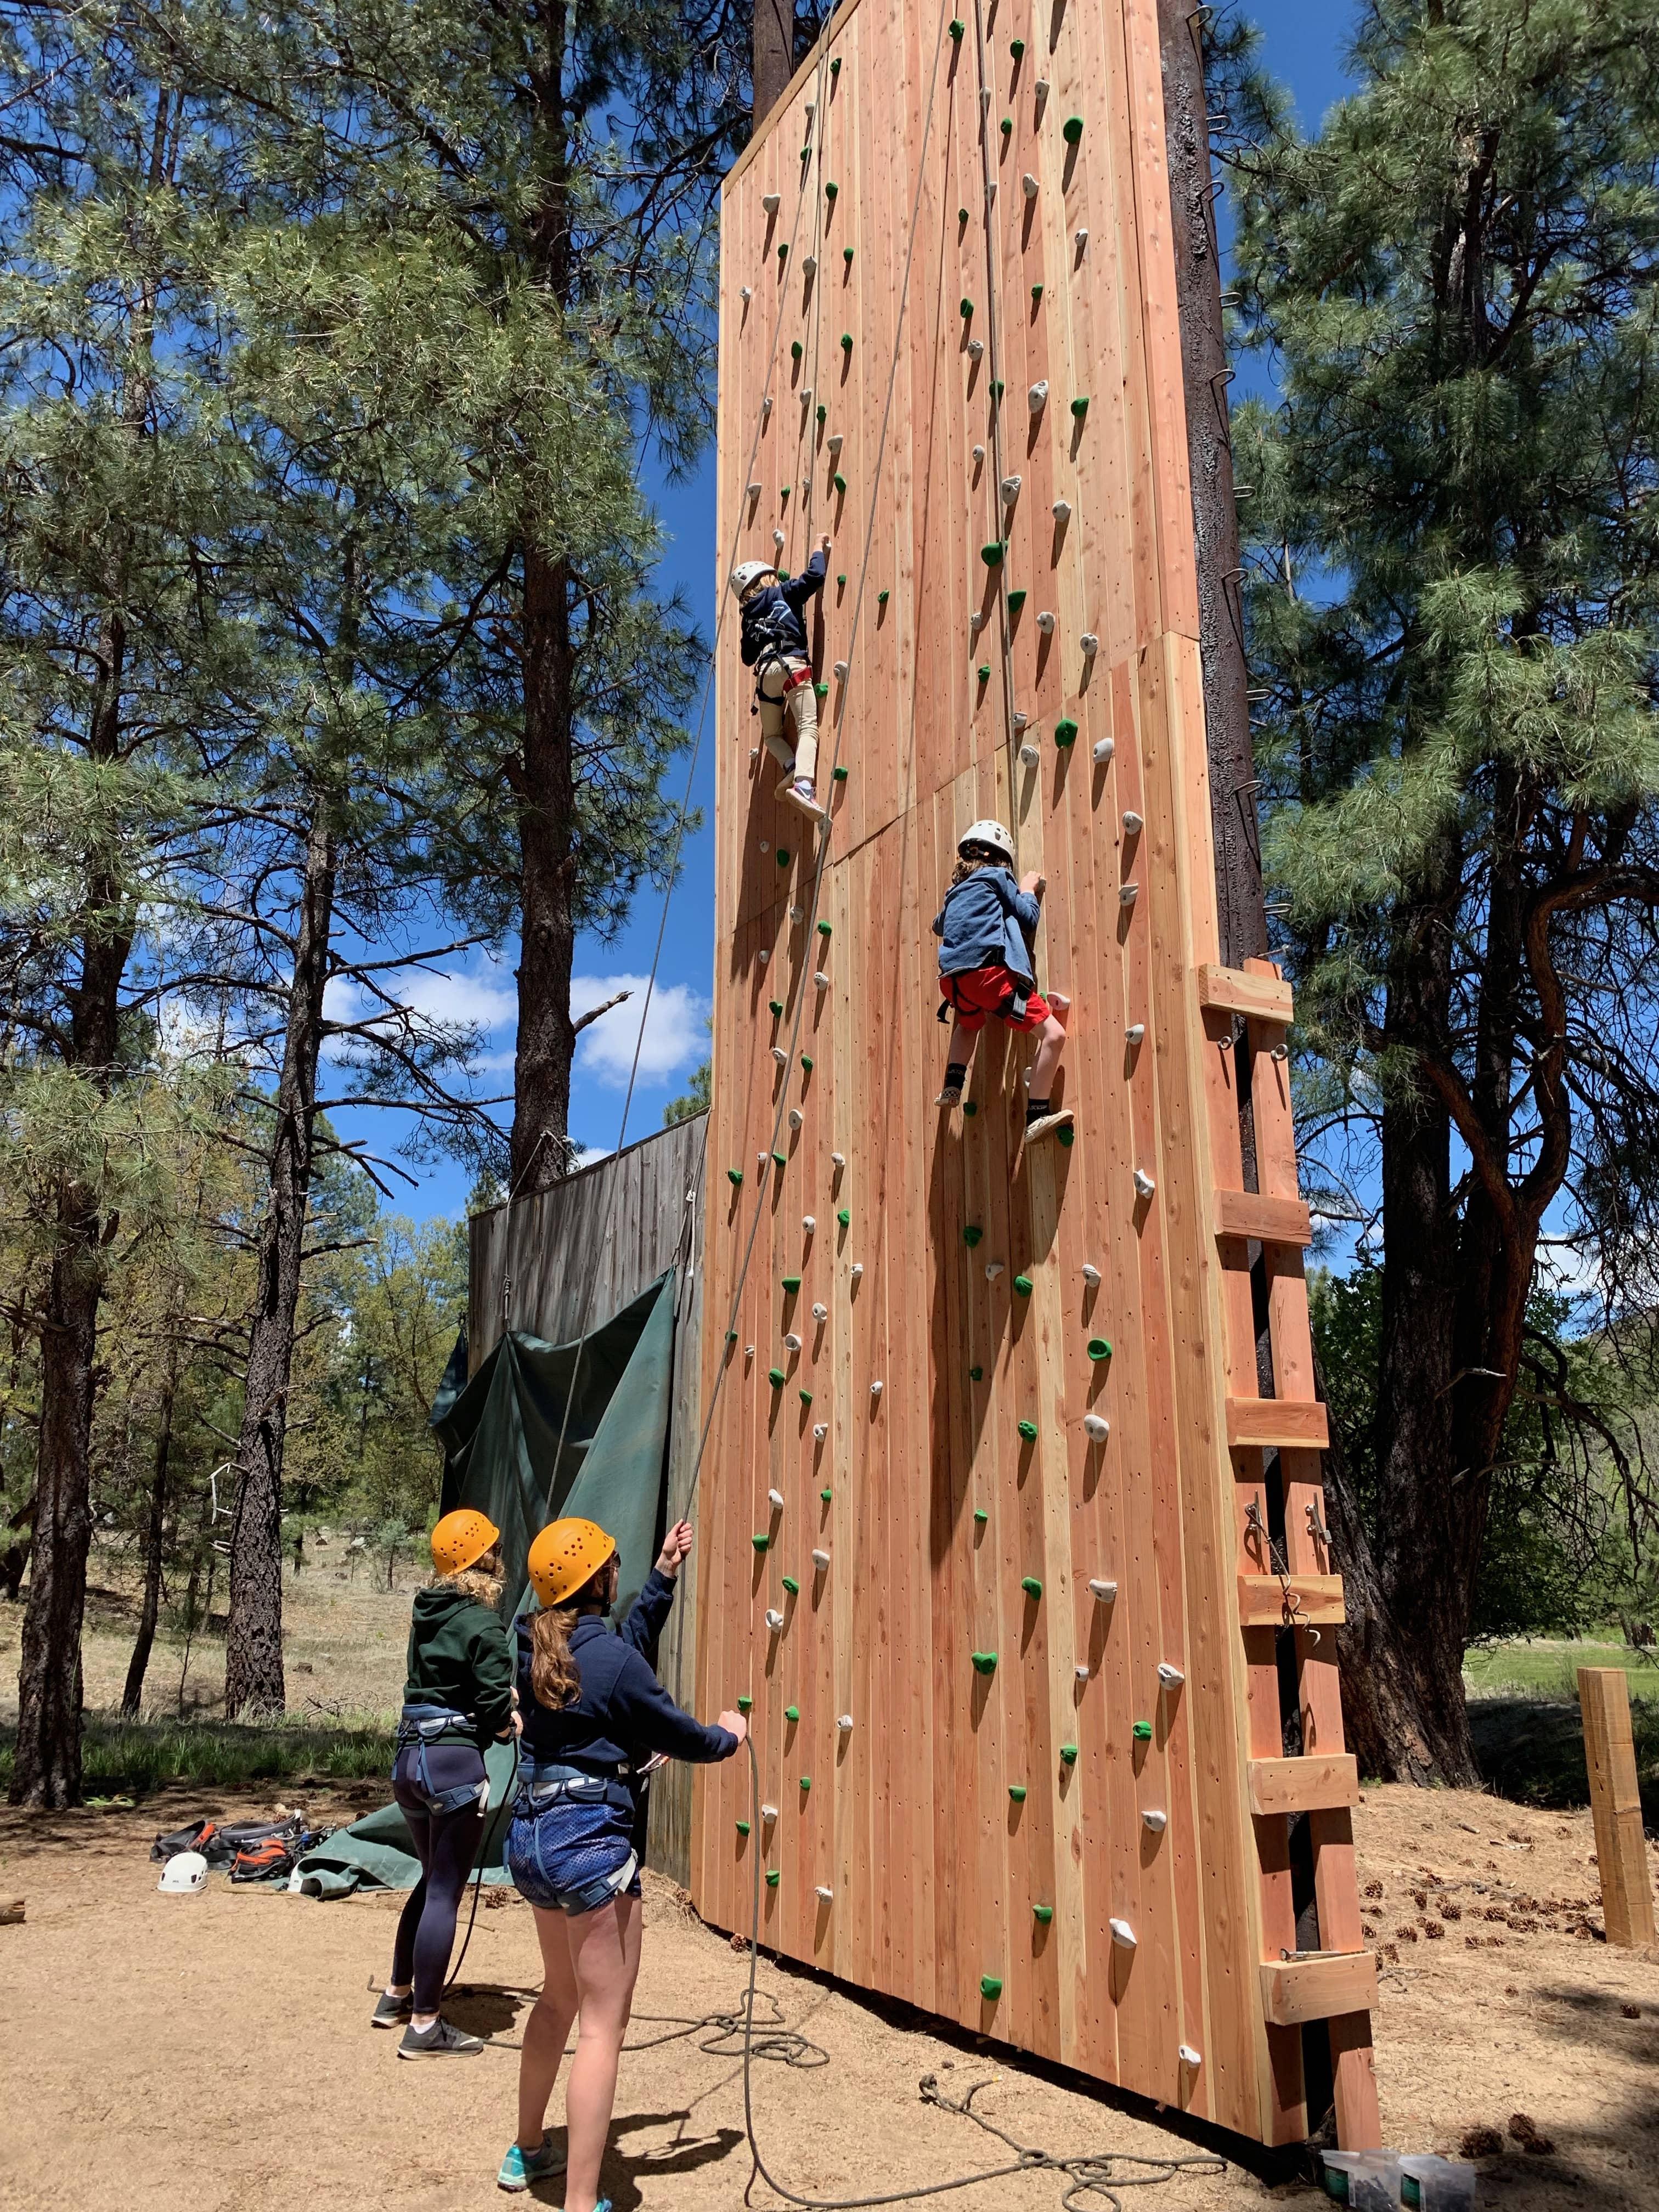 People climbing the climbing wall